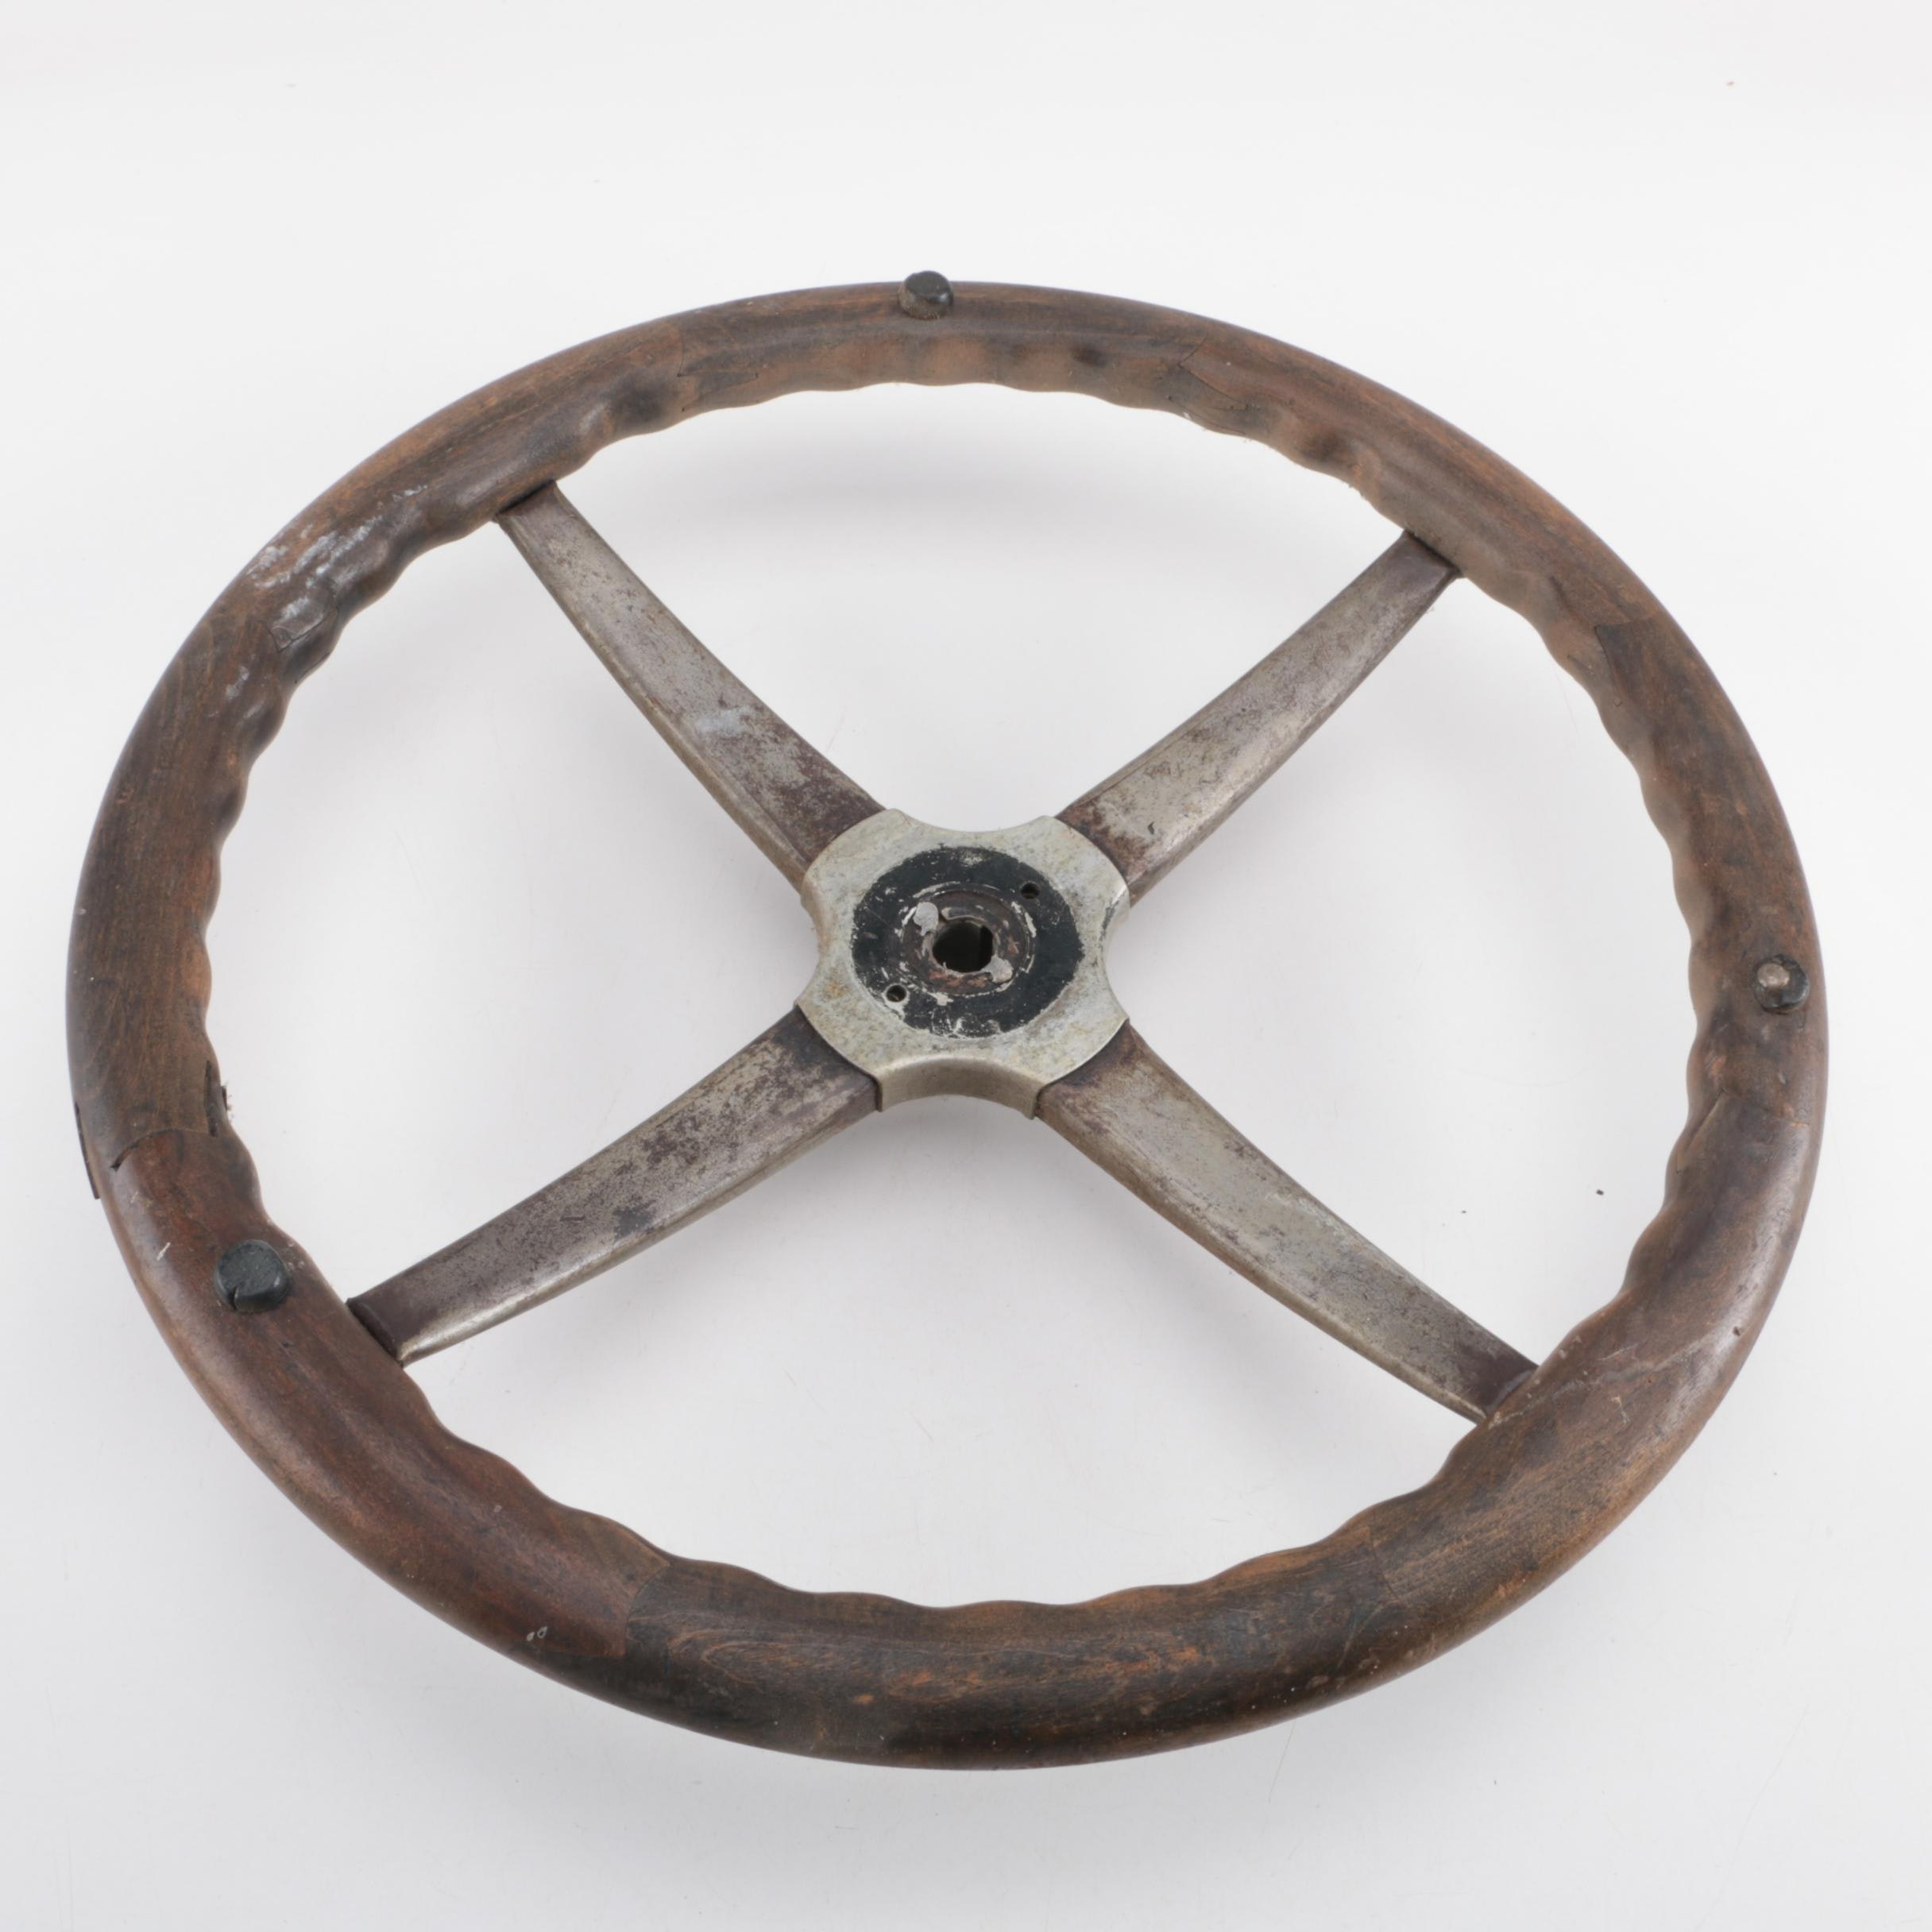 Wooden Steering Wheel, 20th Century